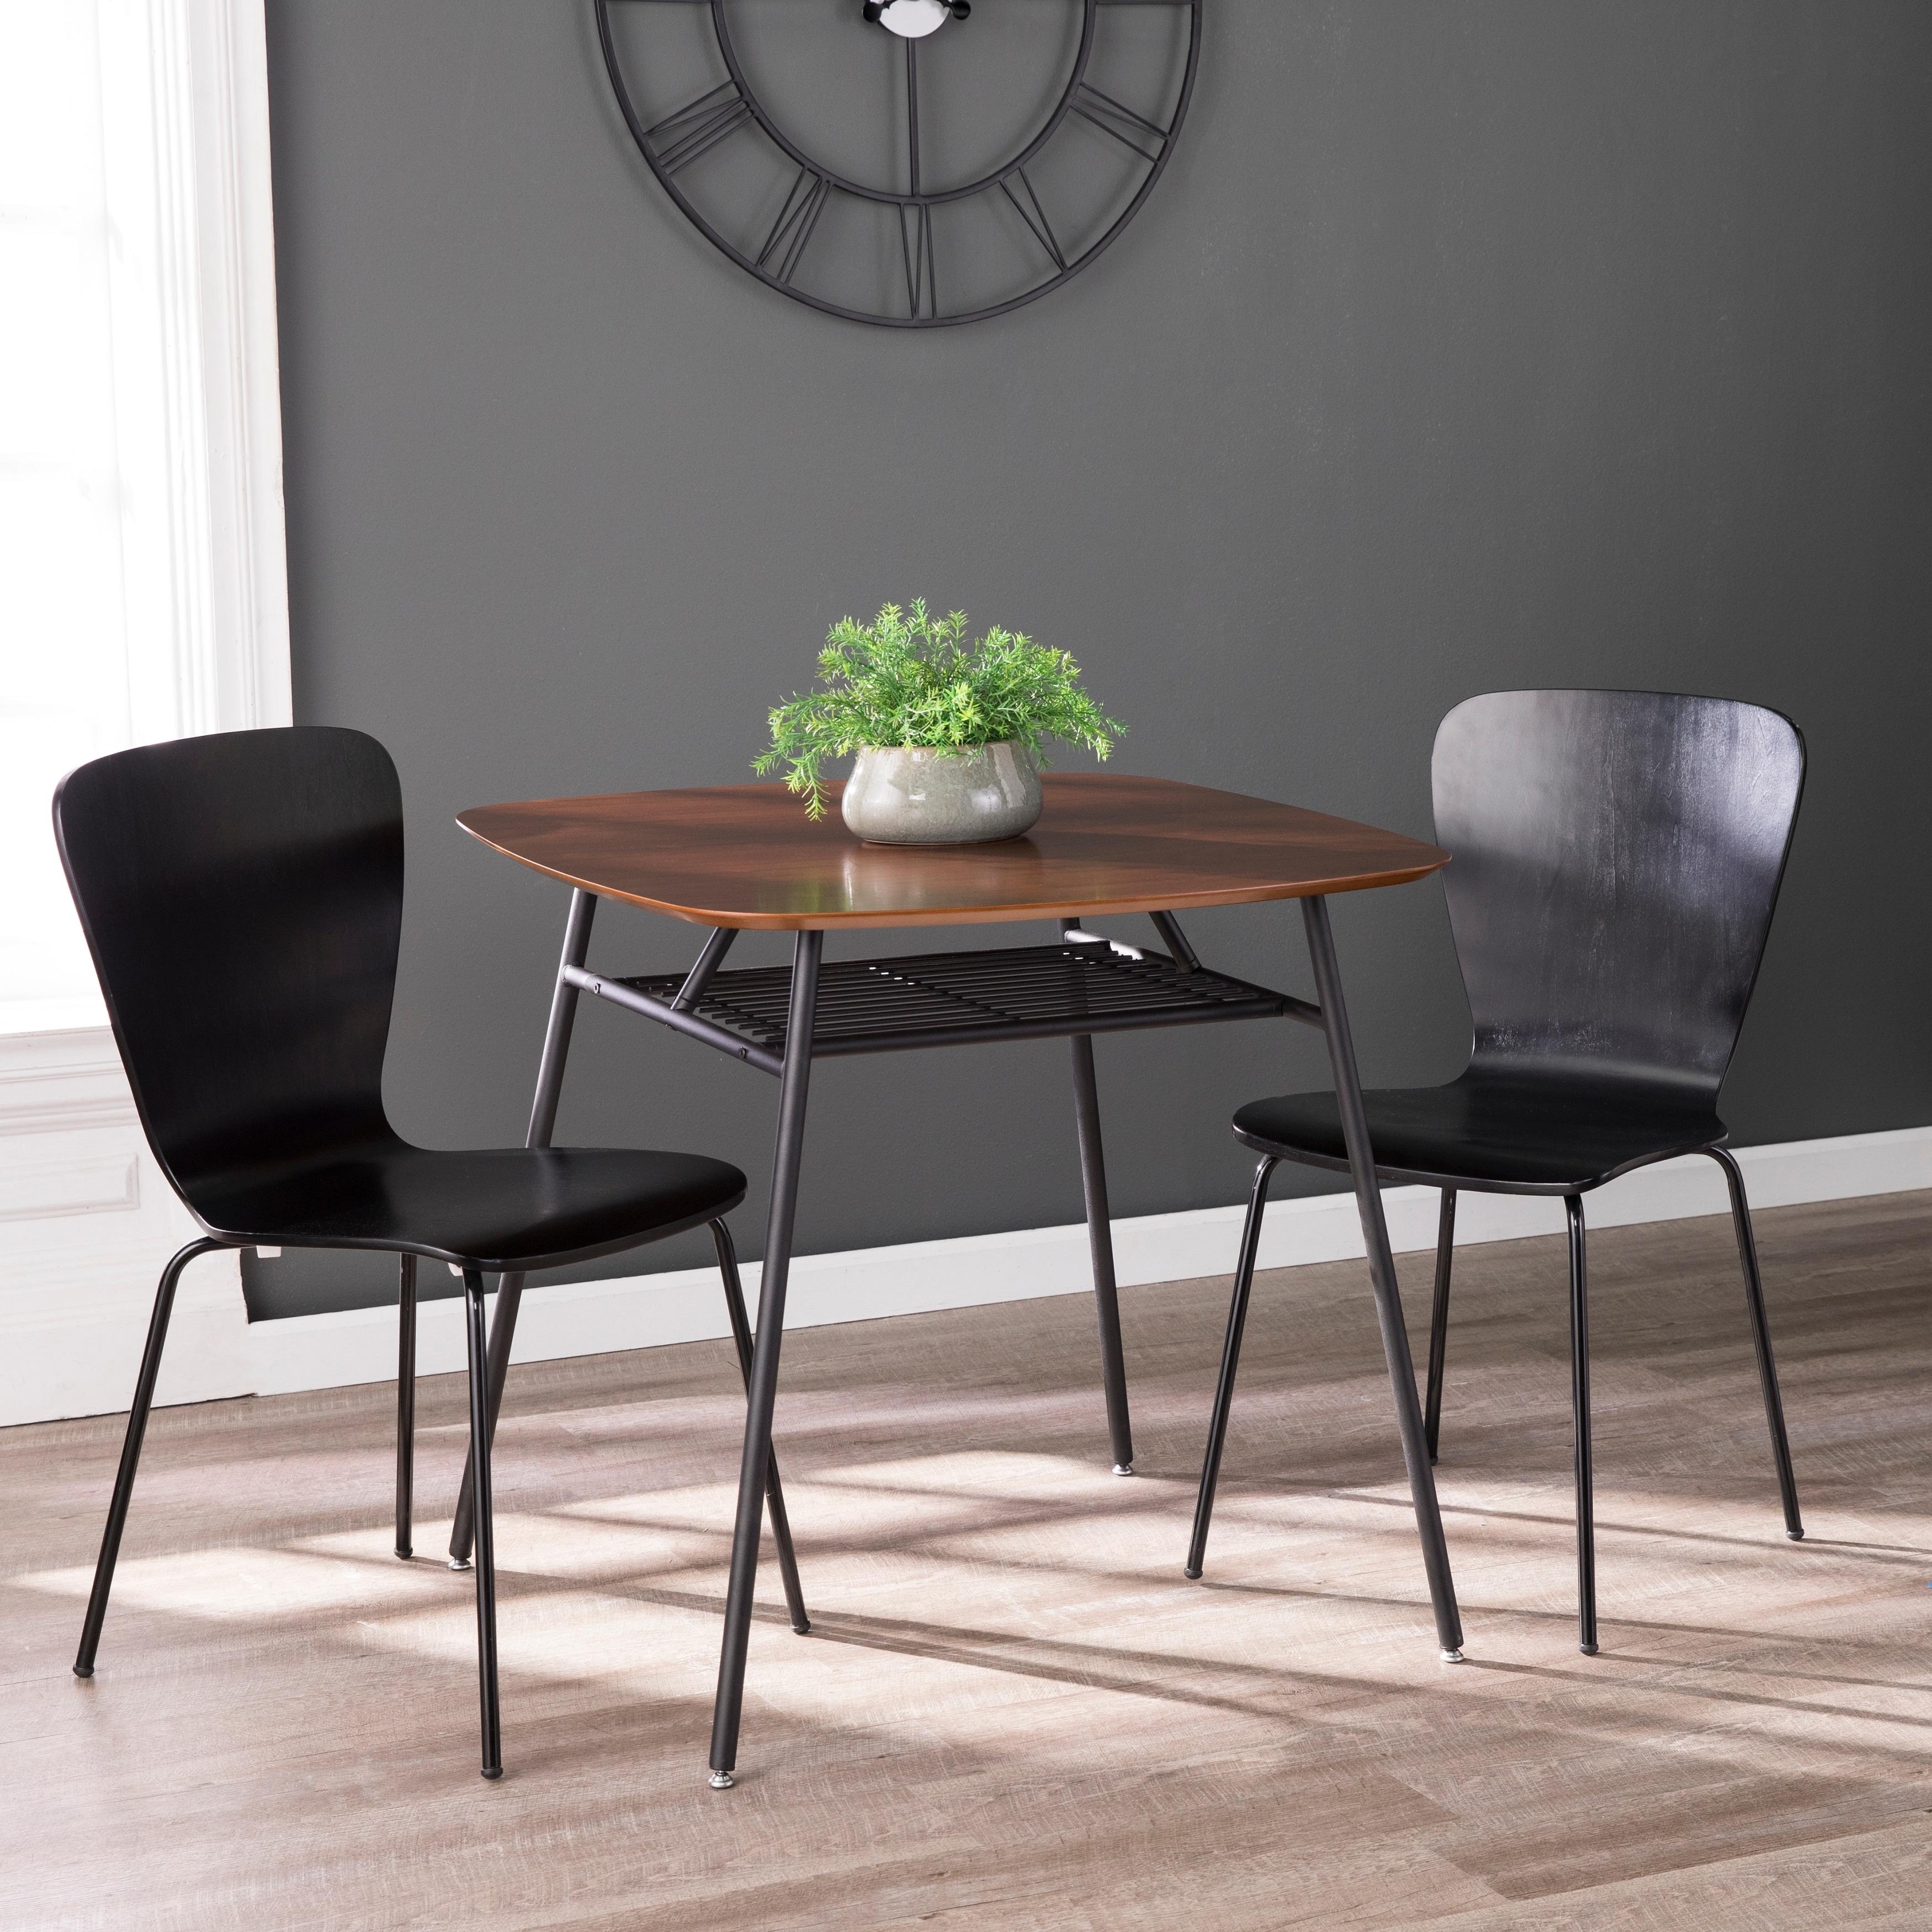 Carson Carrington Walnut Square Dining Table Wood Top W Black Metal Frame Seats 2